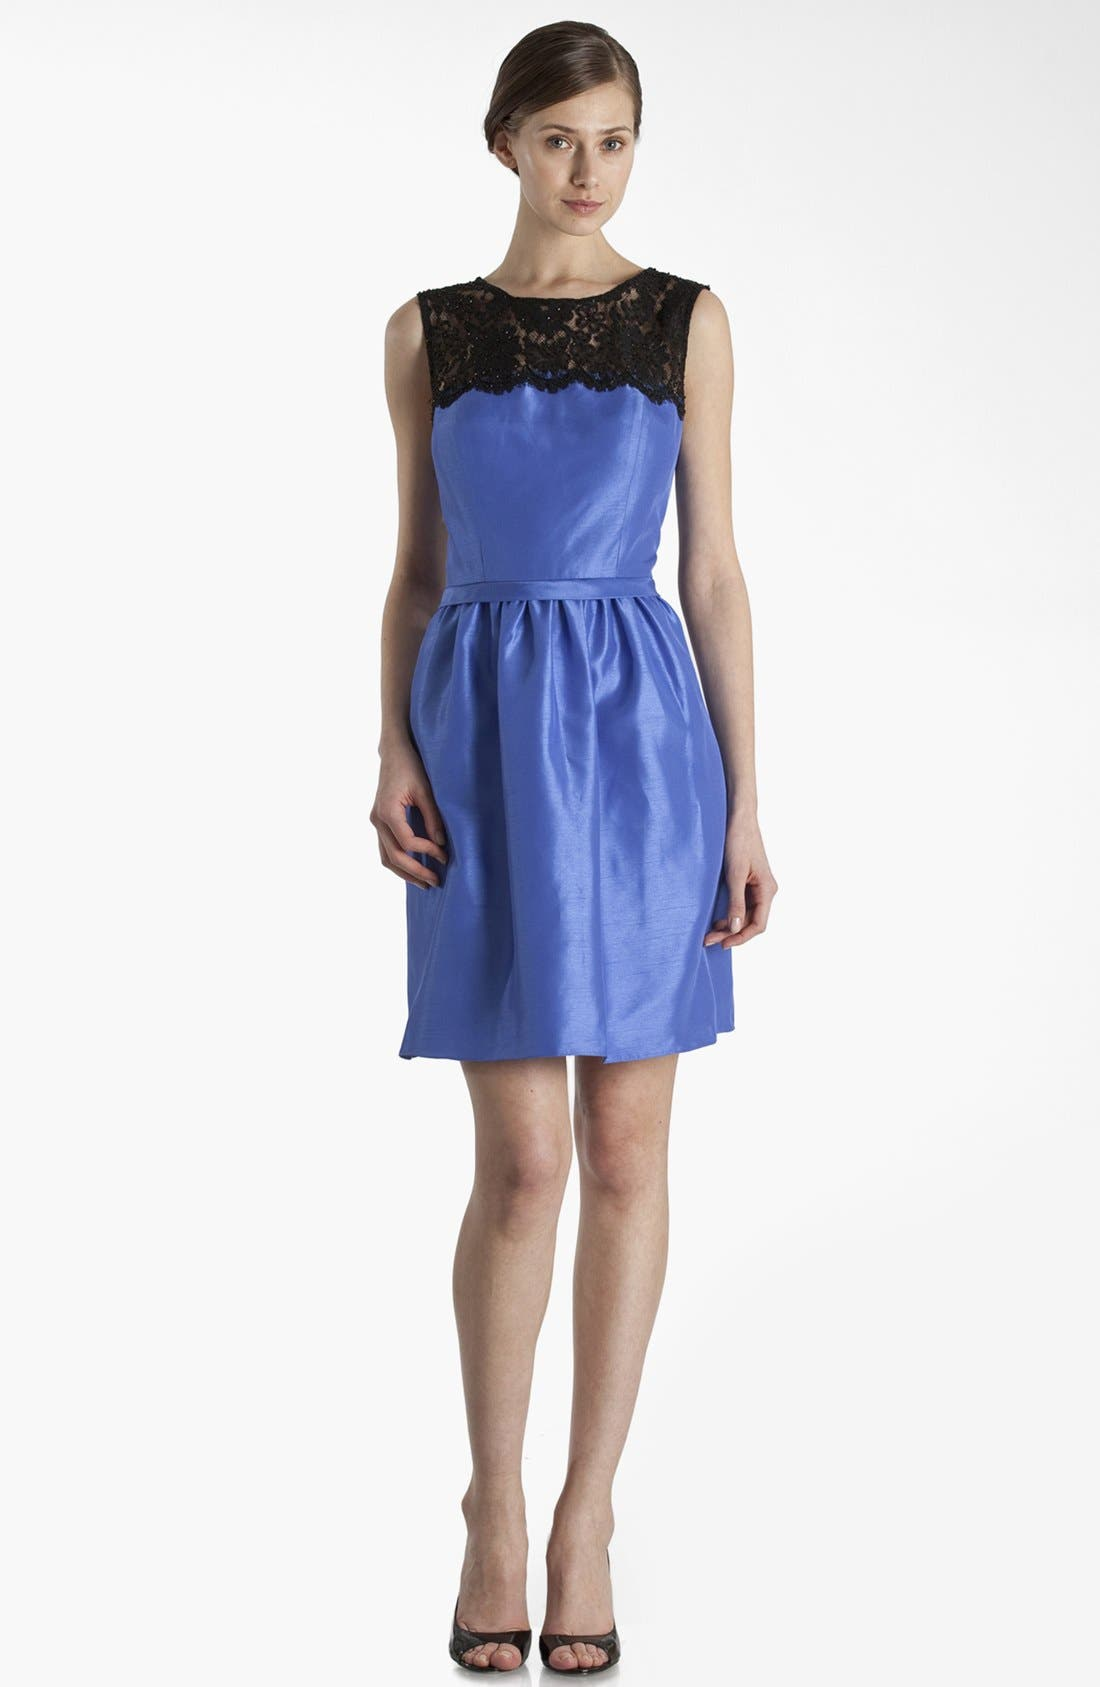 Alternate Image 1 Selected - JS Boutique Lace Yoke Fit & Flare Dress